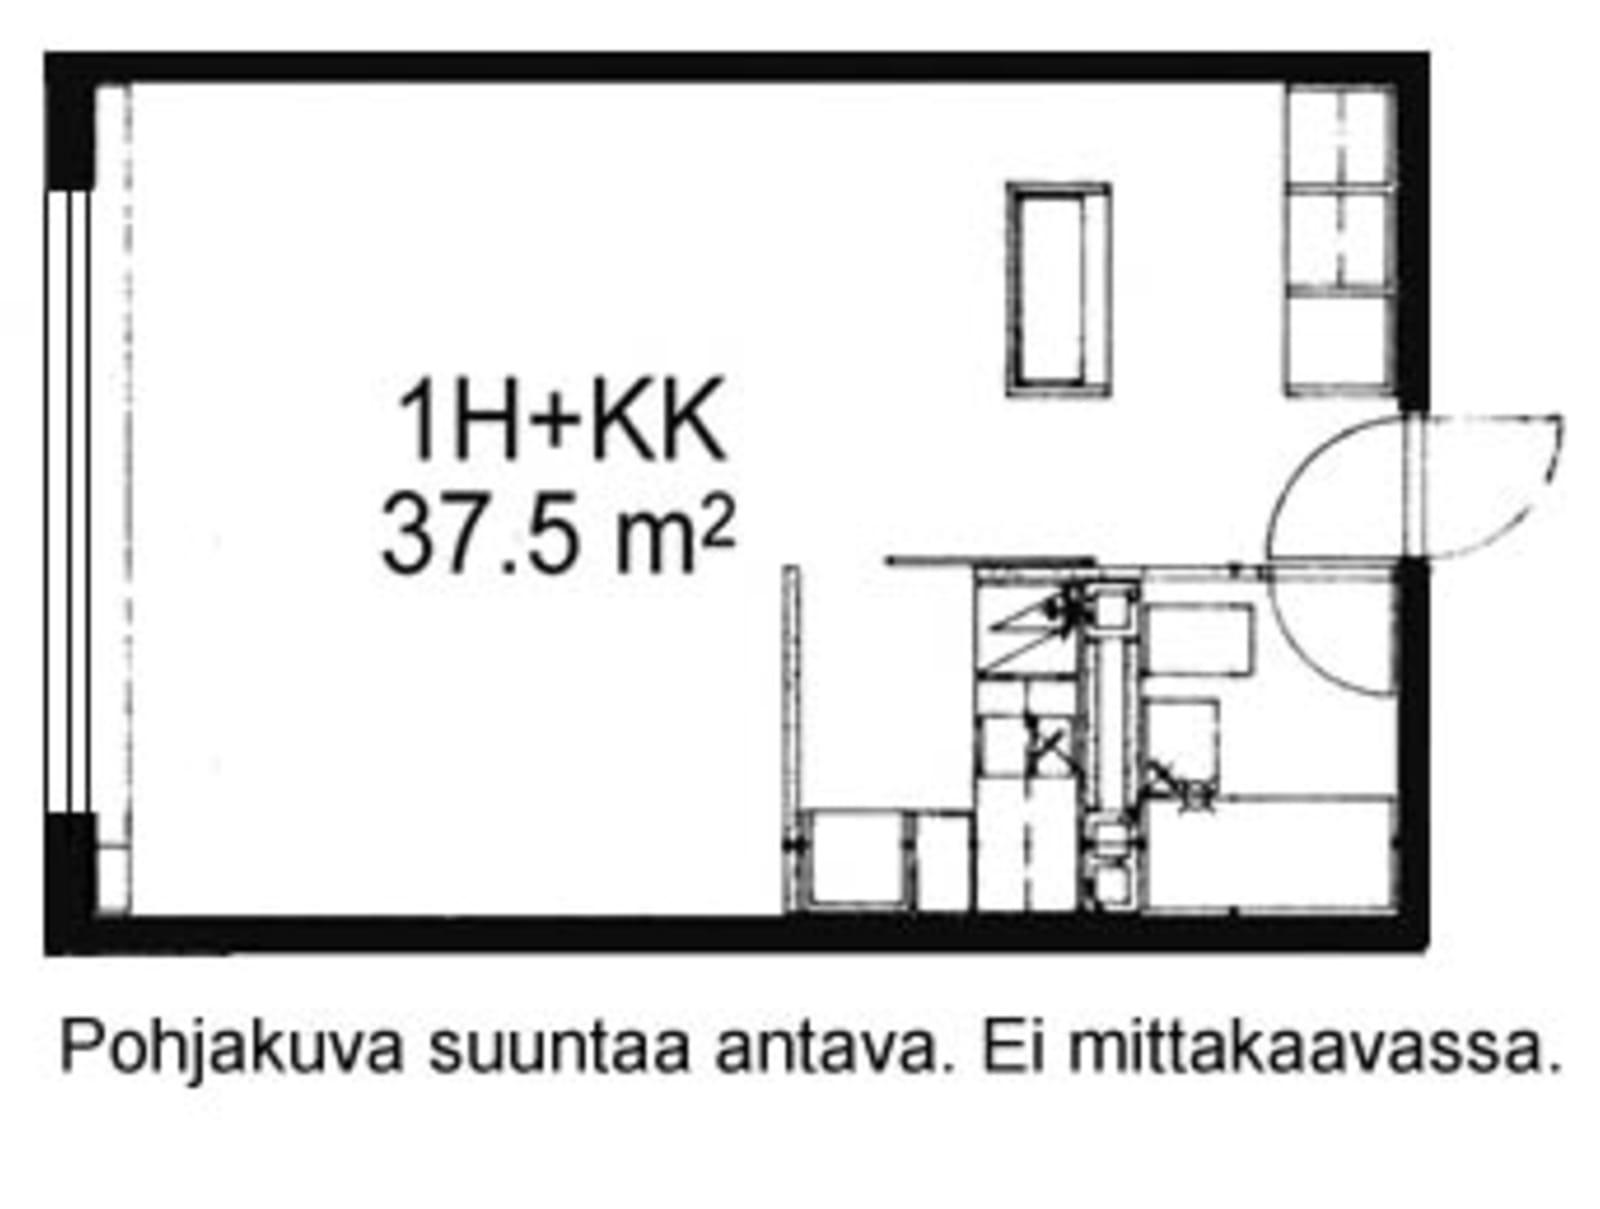 Oulu, Kaukovainio, Tuulihaukantie 9 A 011